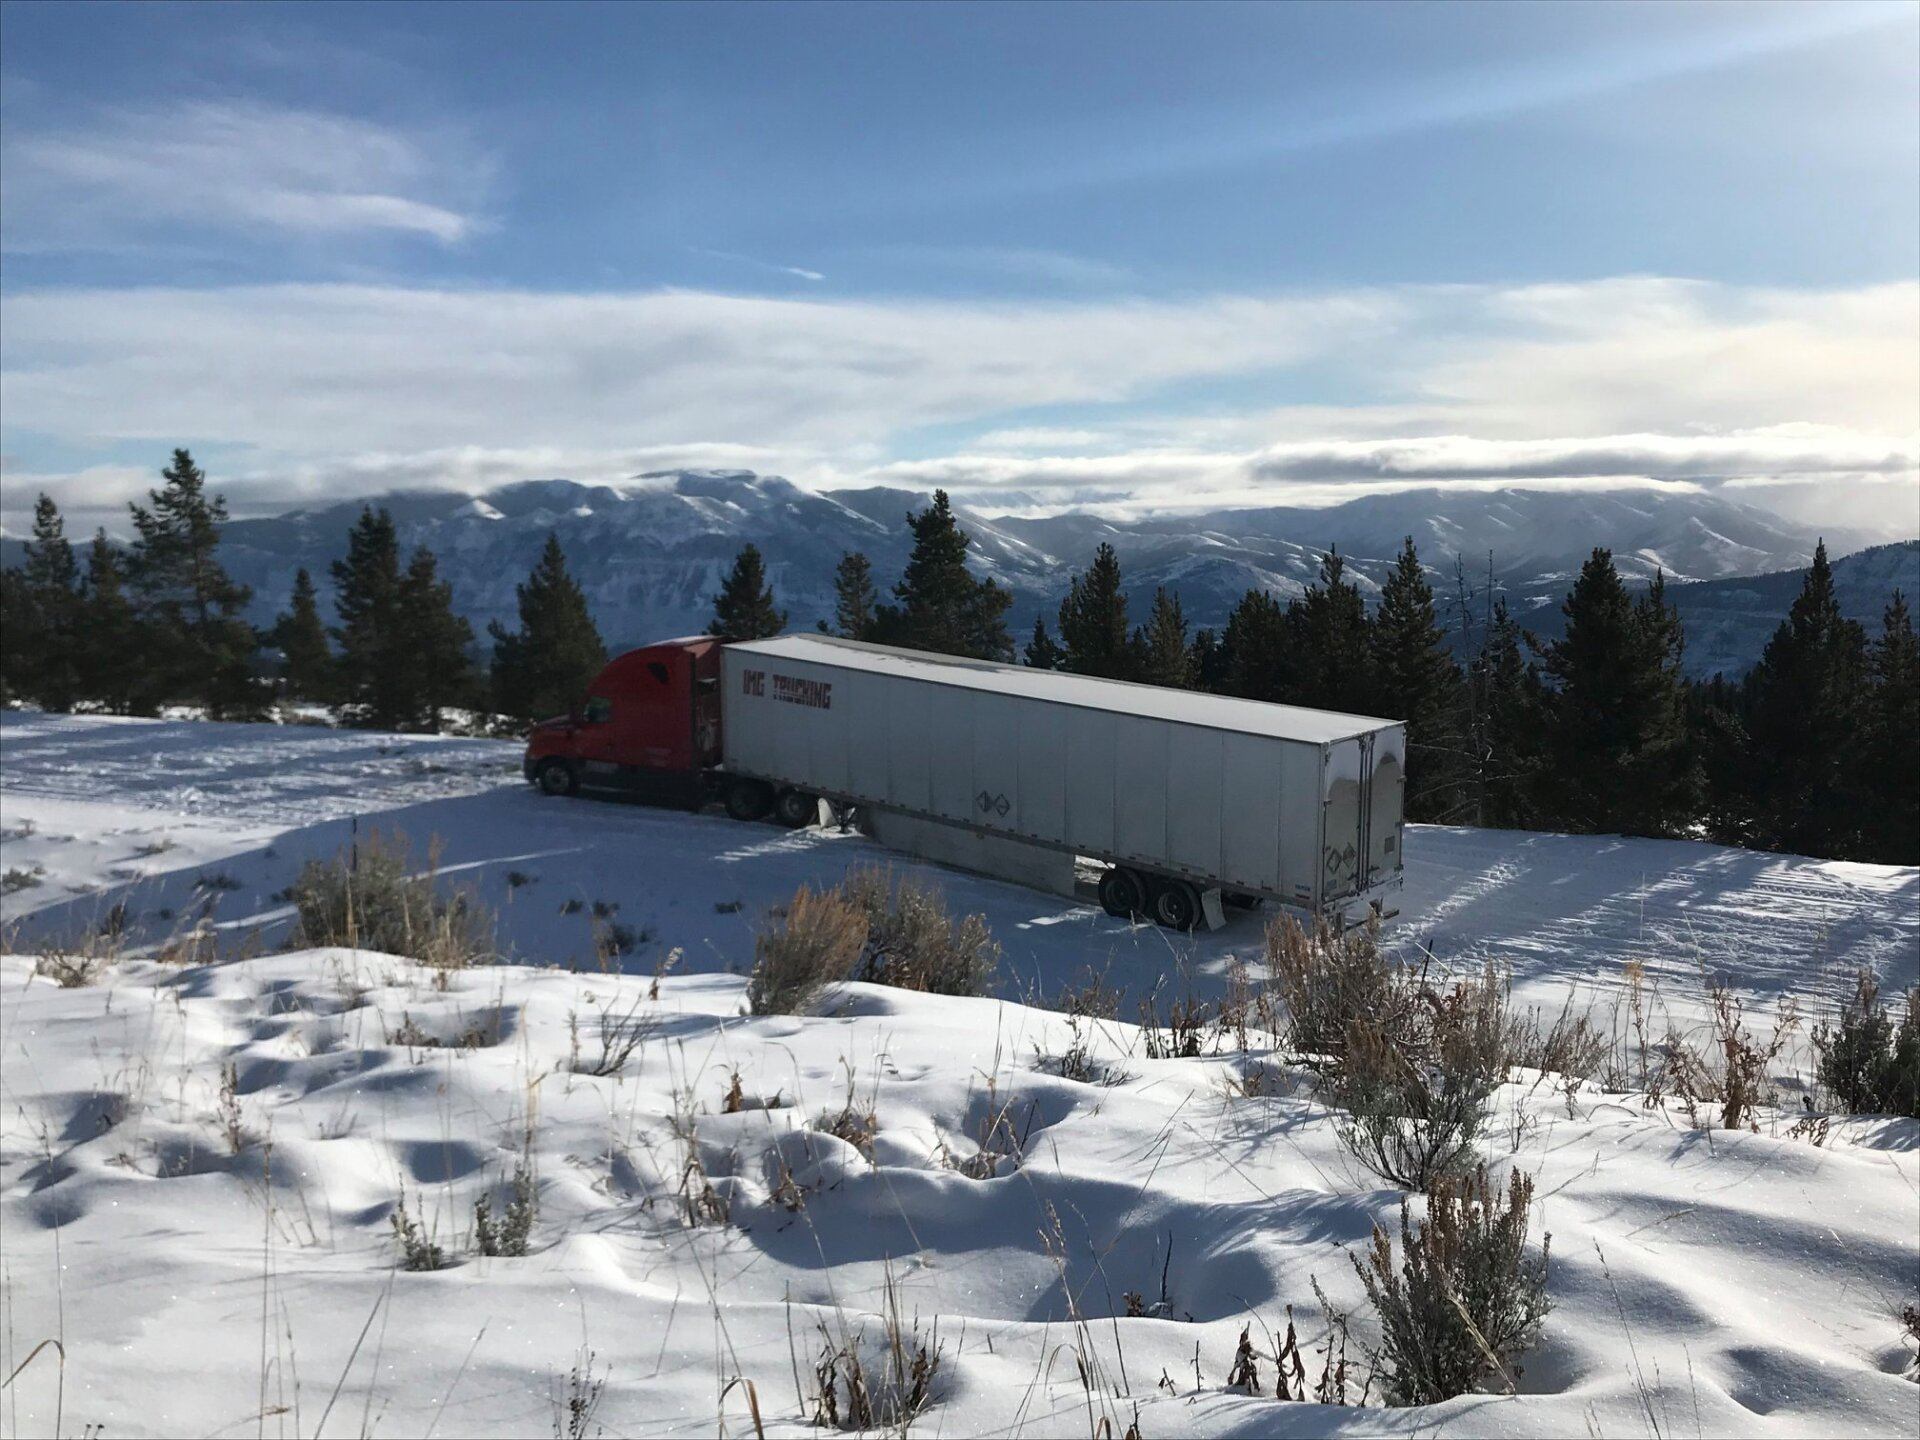 Photos: Authorities urge winter preparedness after semi (hauling snowmobiles) gets stuck inWyoming